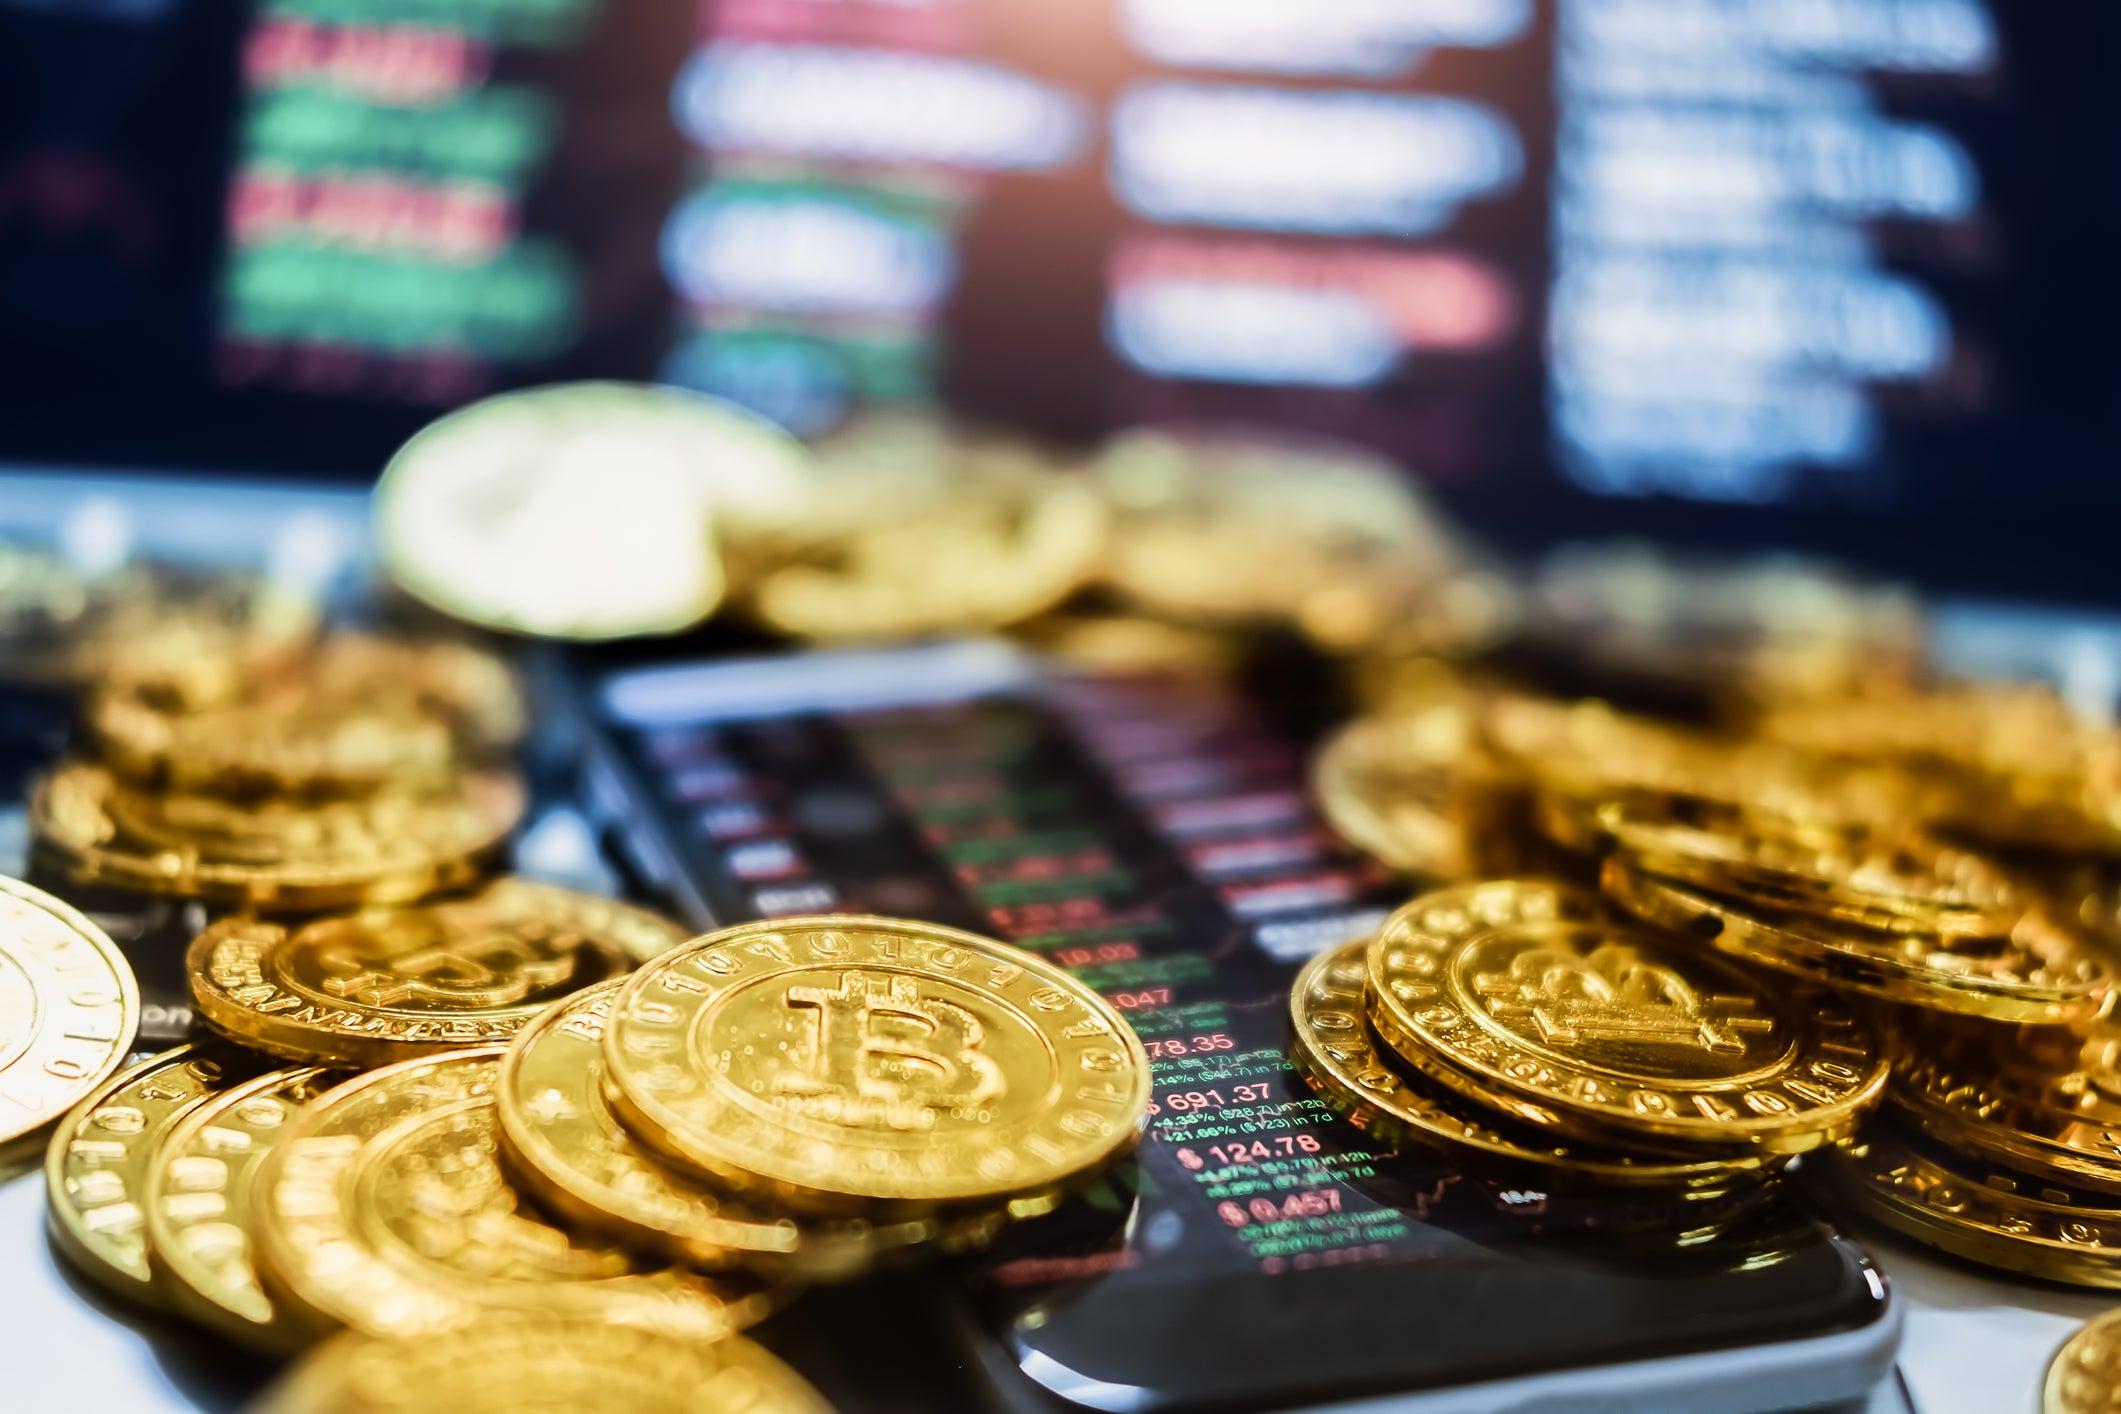 Akankah Kemitraan Cryptocurrency Baru Shopify Memperluas Paratnya?